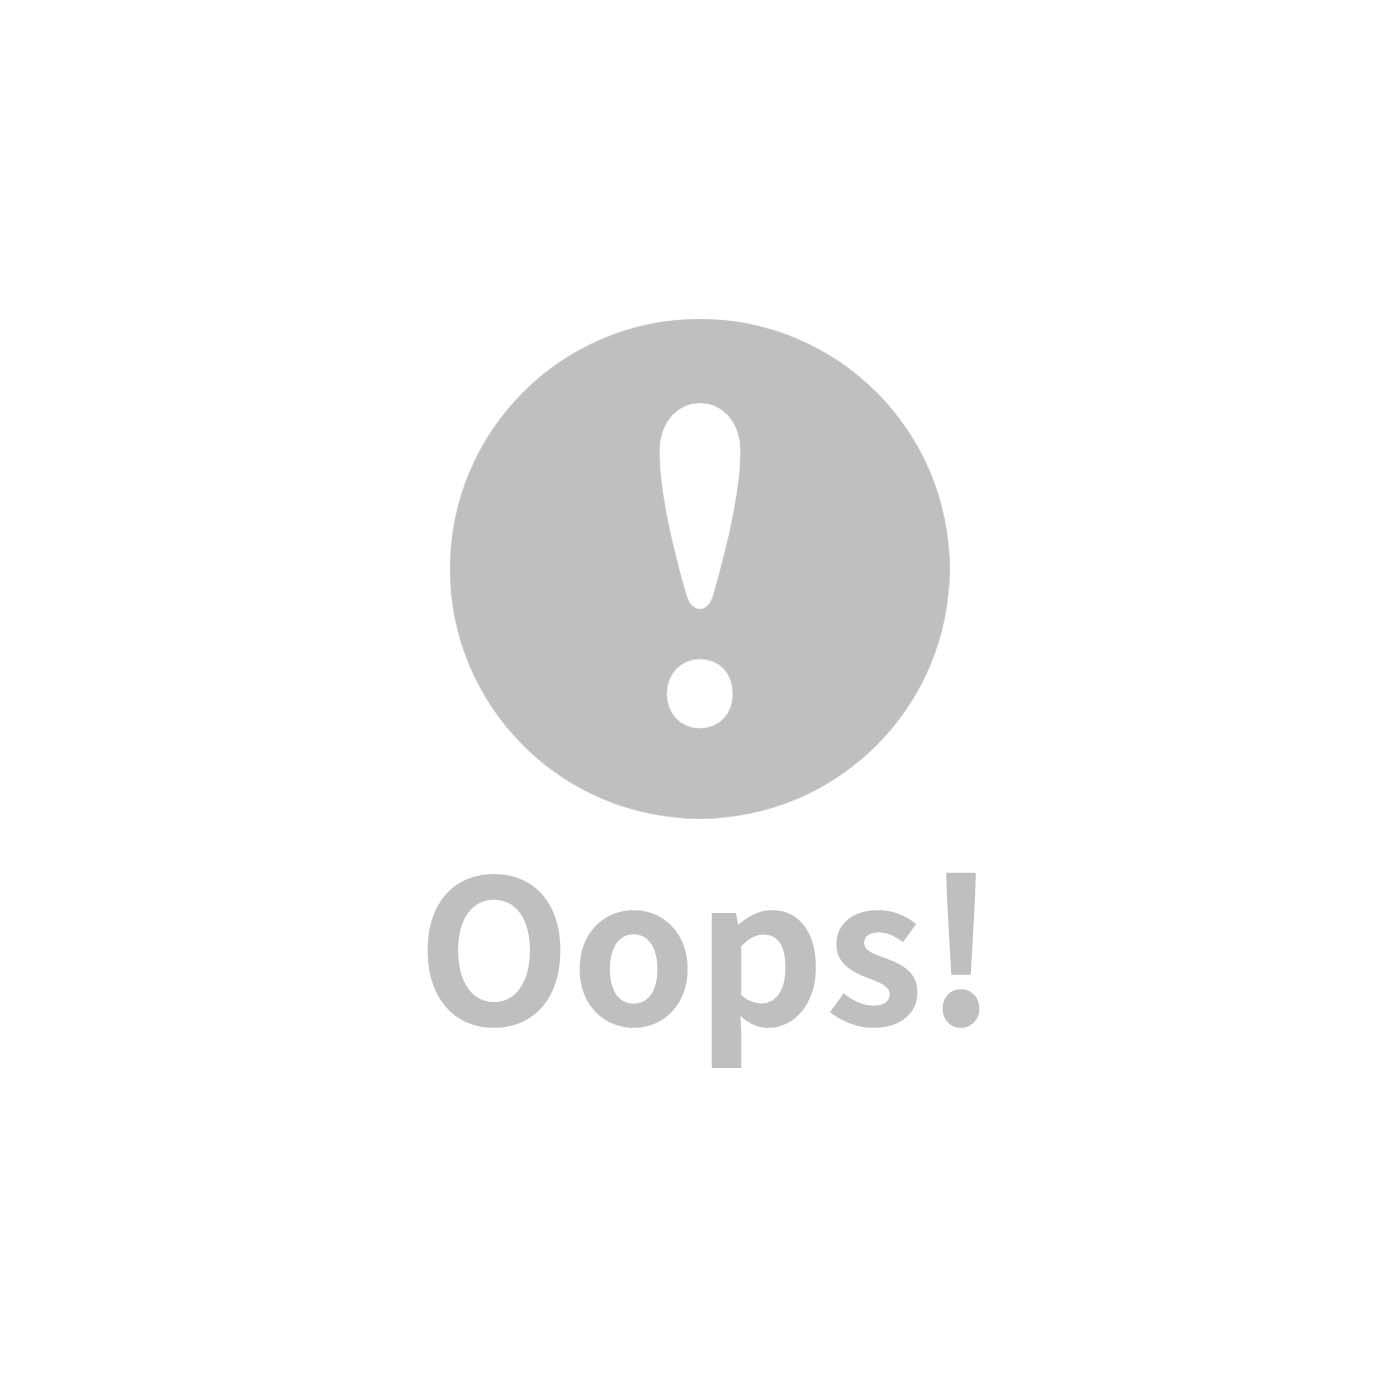 global affairs 童話手工編織安撫玩偶(27cm)-馴鹿魯道夫